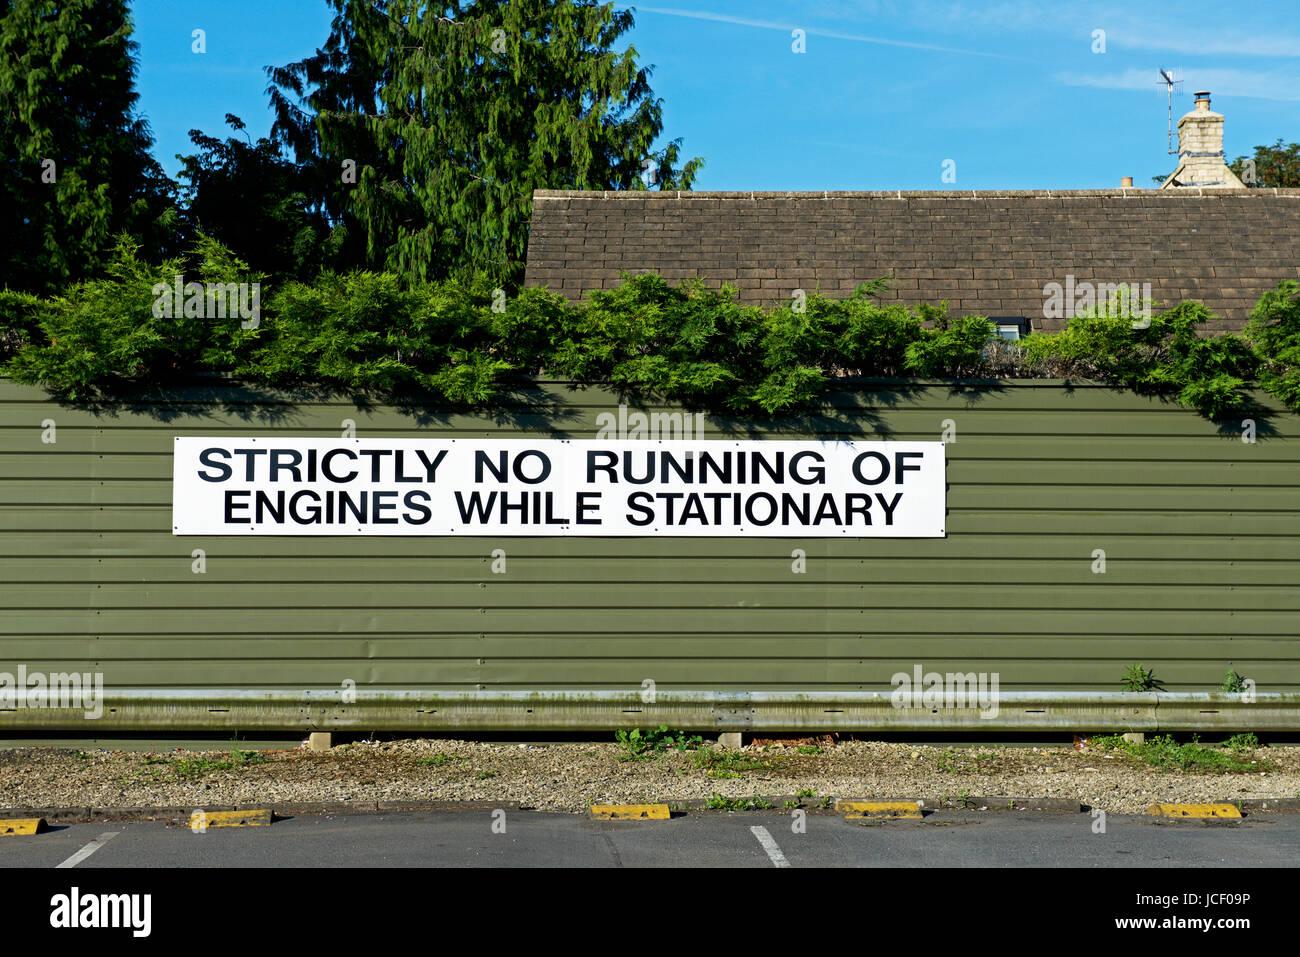 Sign - strictly no running of engines while stationary - England UK - Stock Image